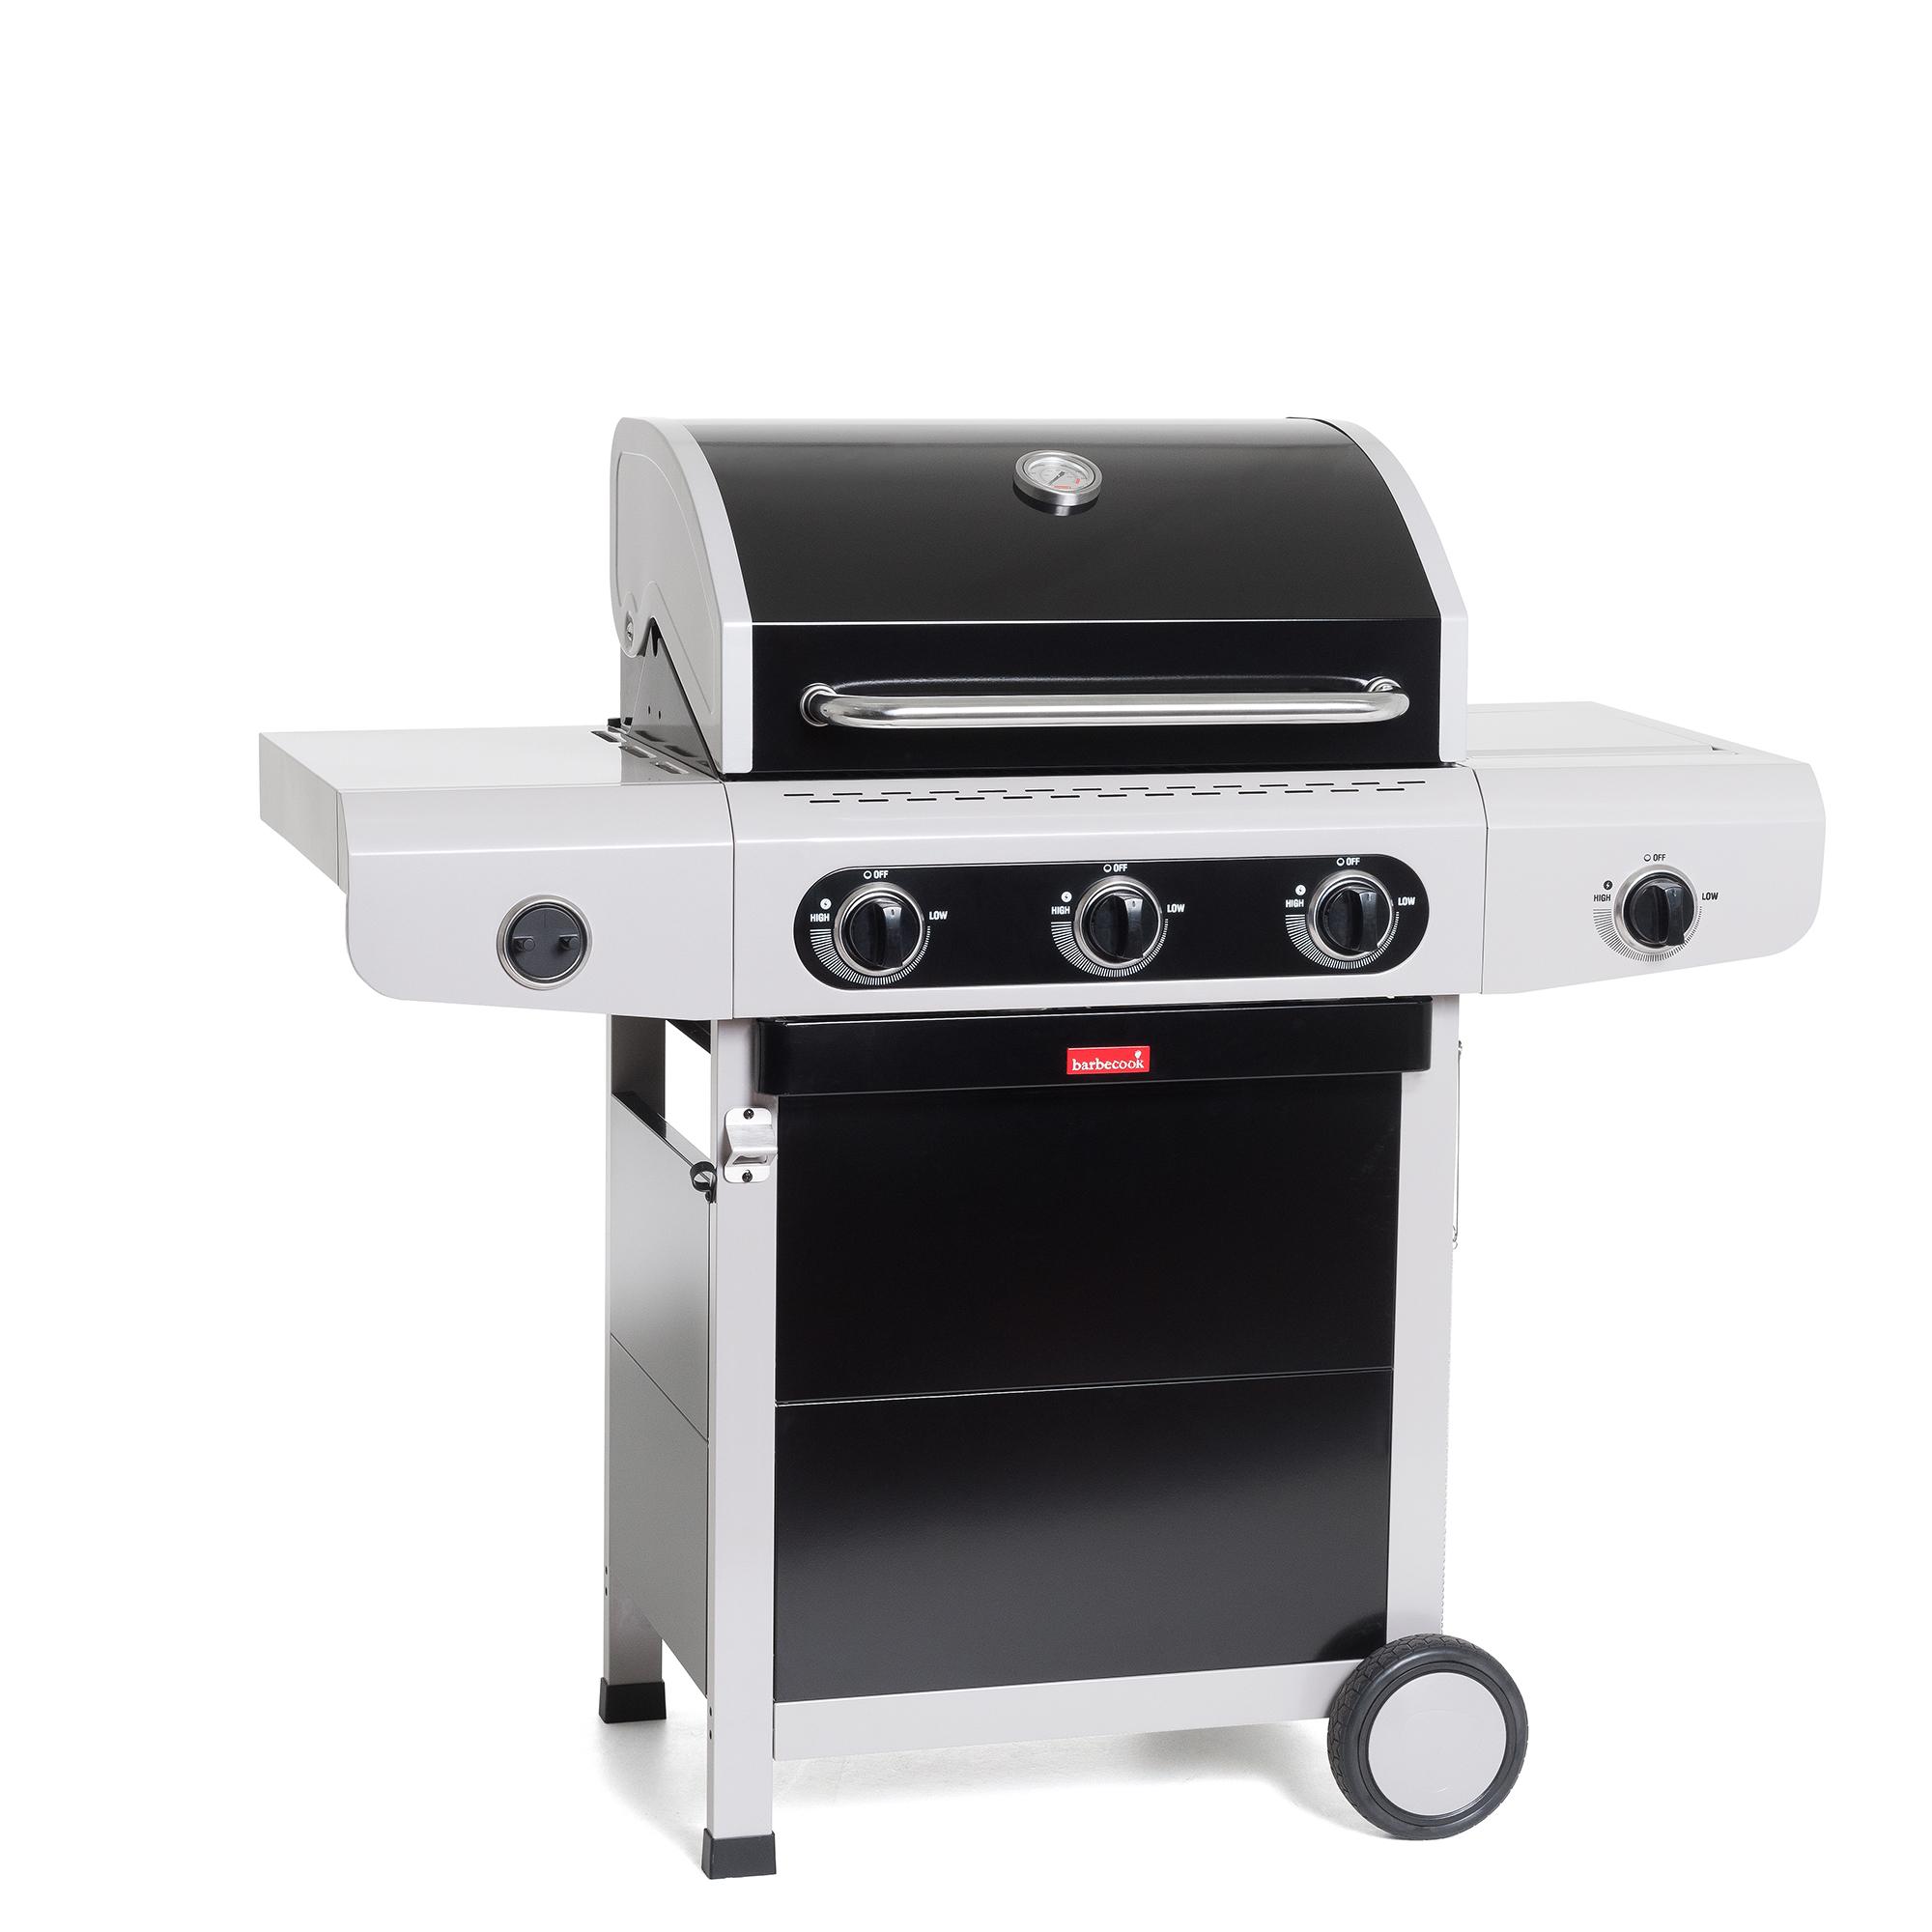 Barbecook Siesta 310 Black Edition gas barbecue 12